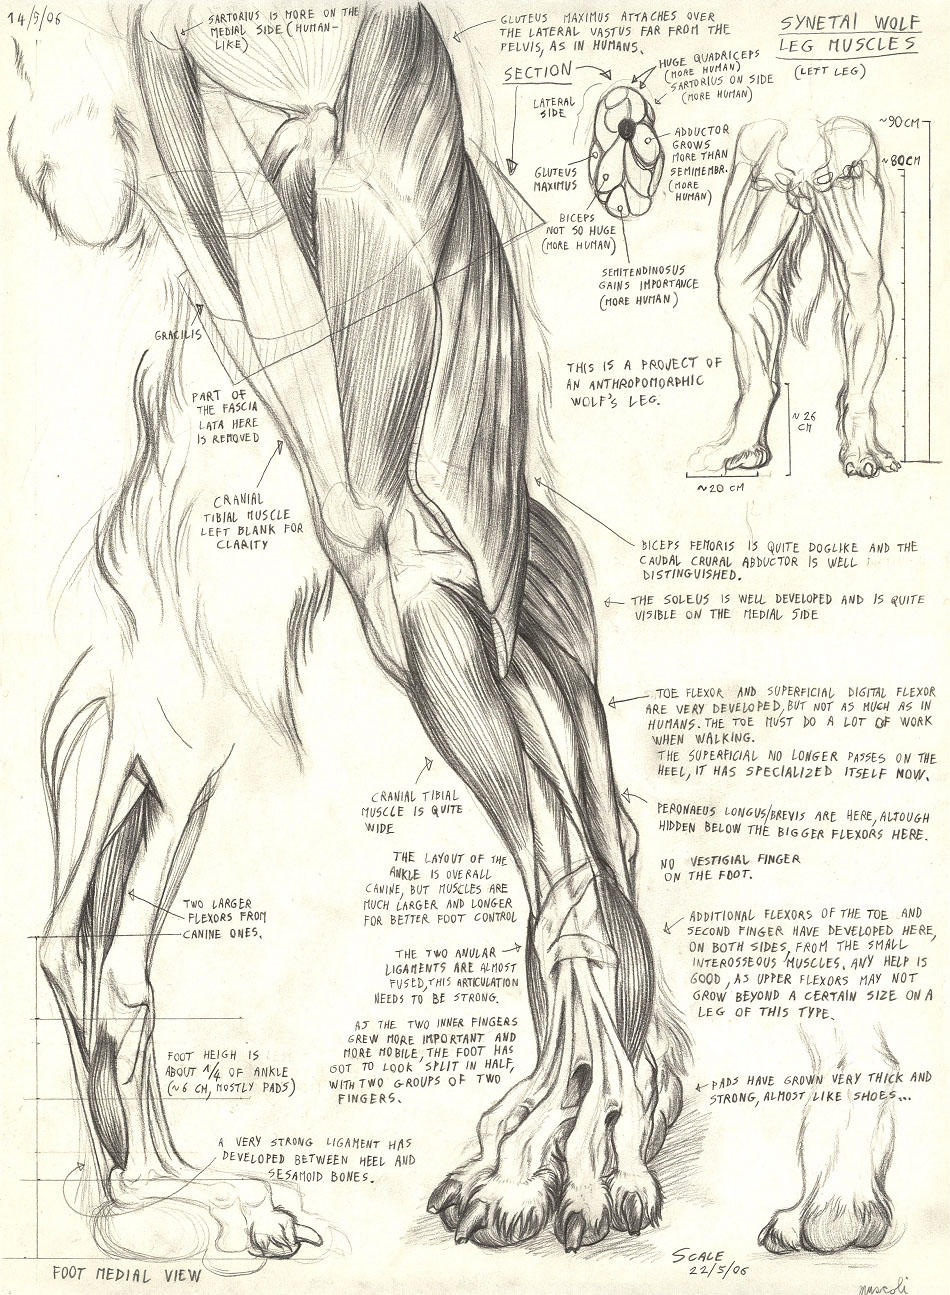 Synetai wolf leg by Alessio-Scalerandi